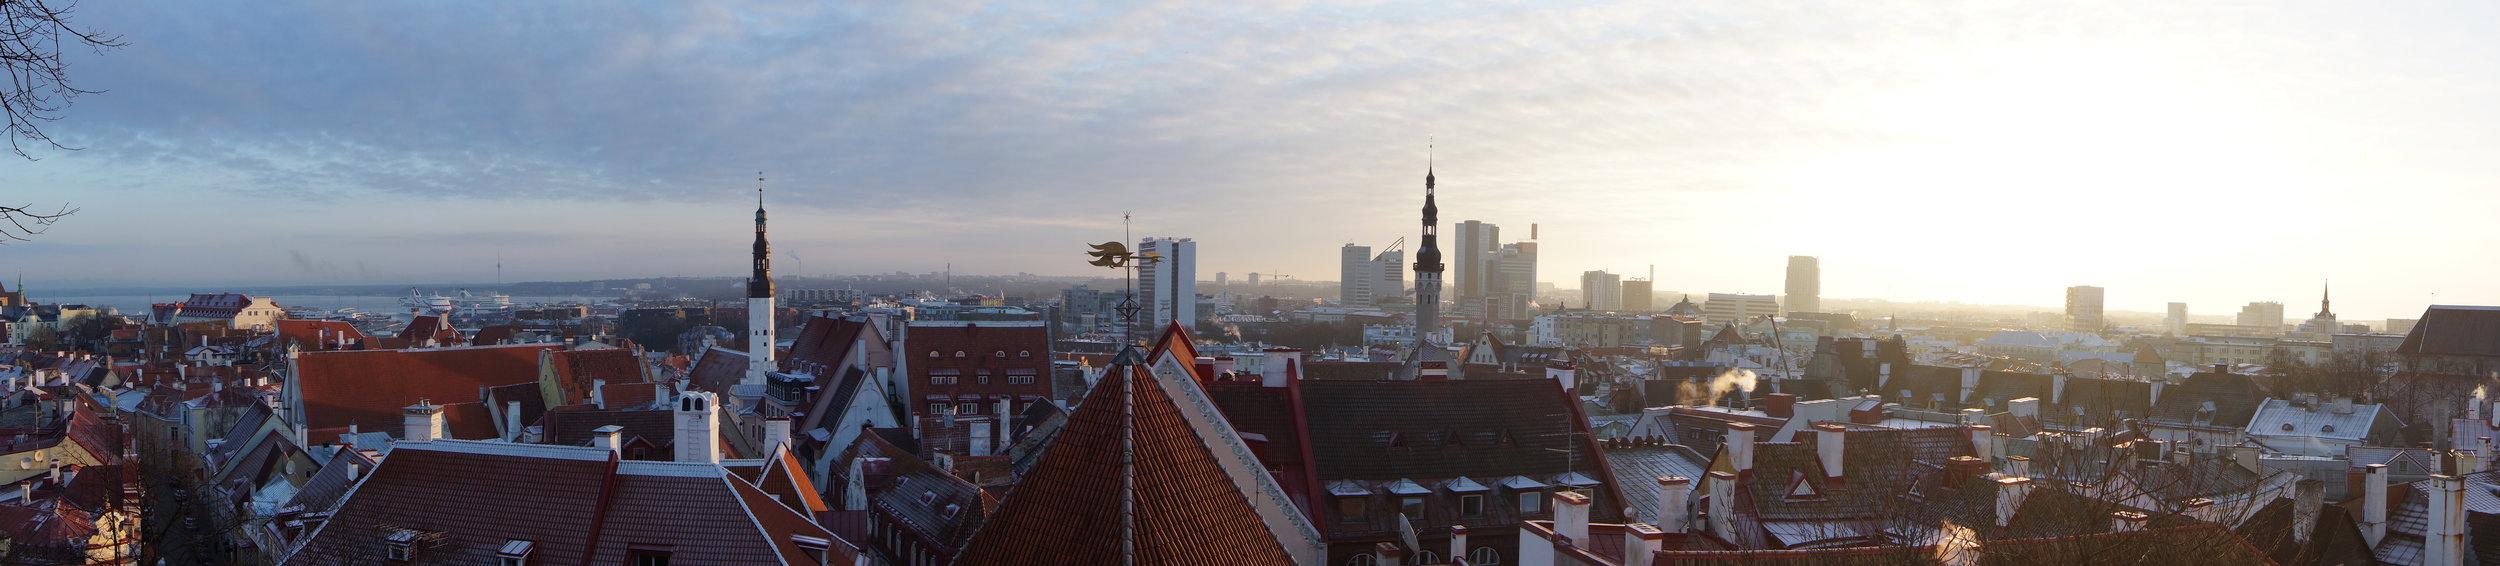 Tallinnpano2.jpg